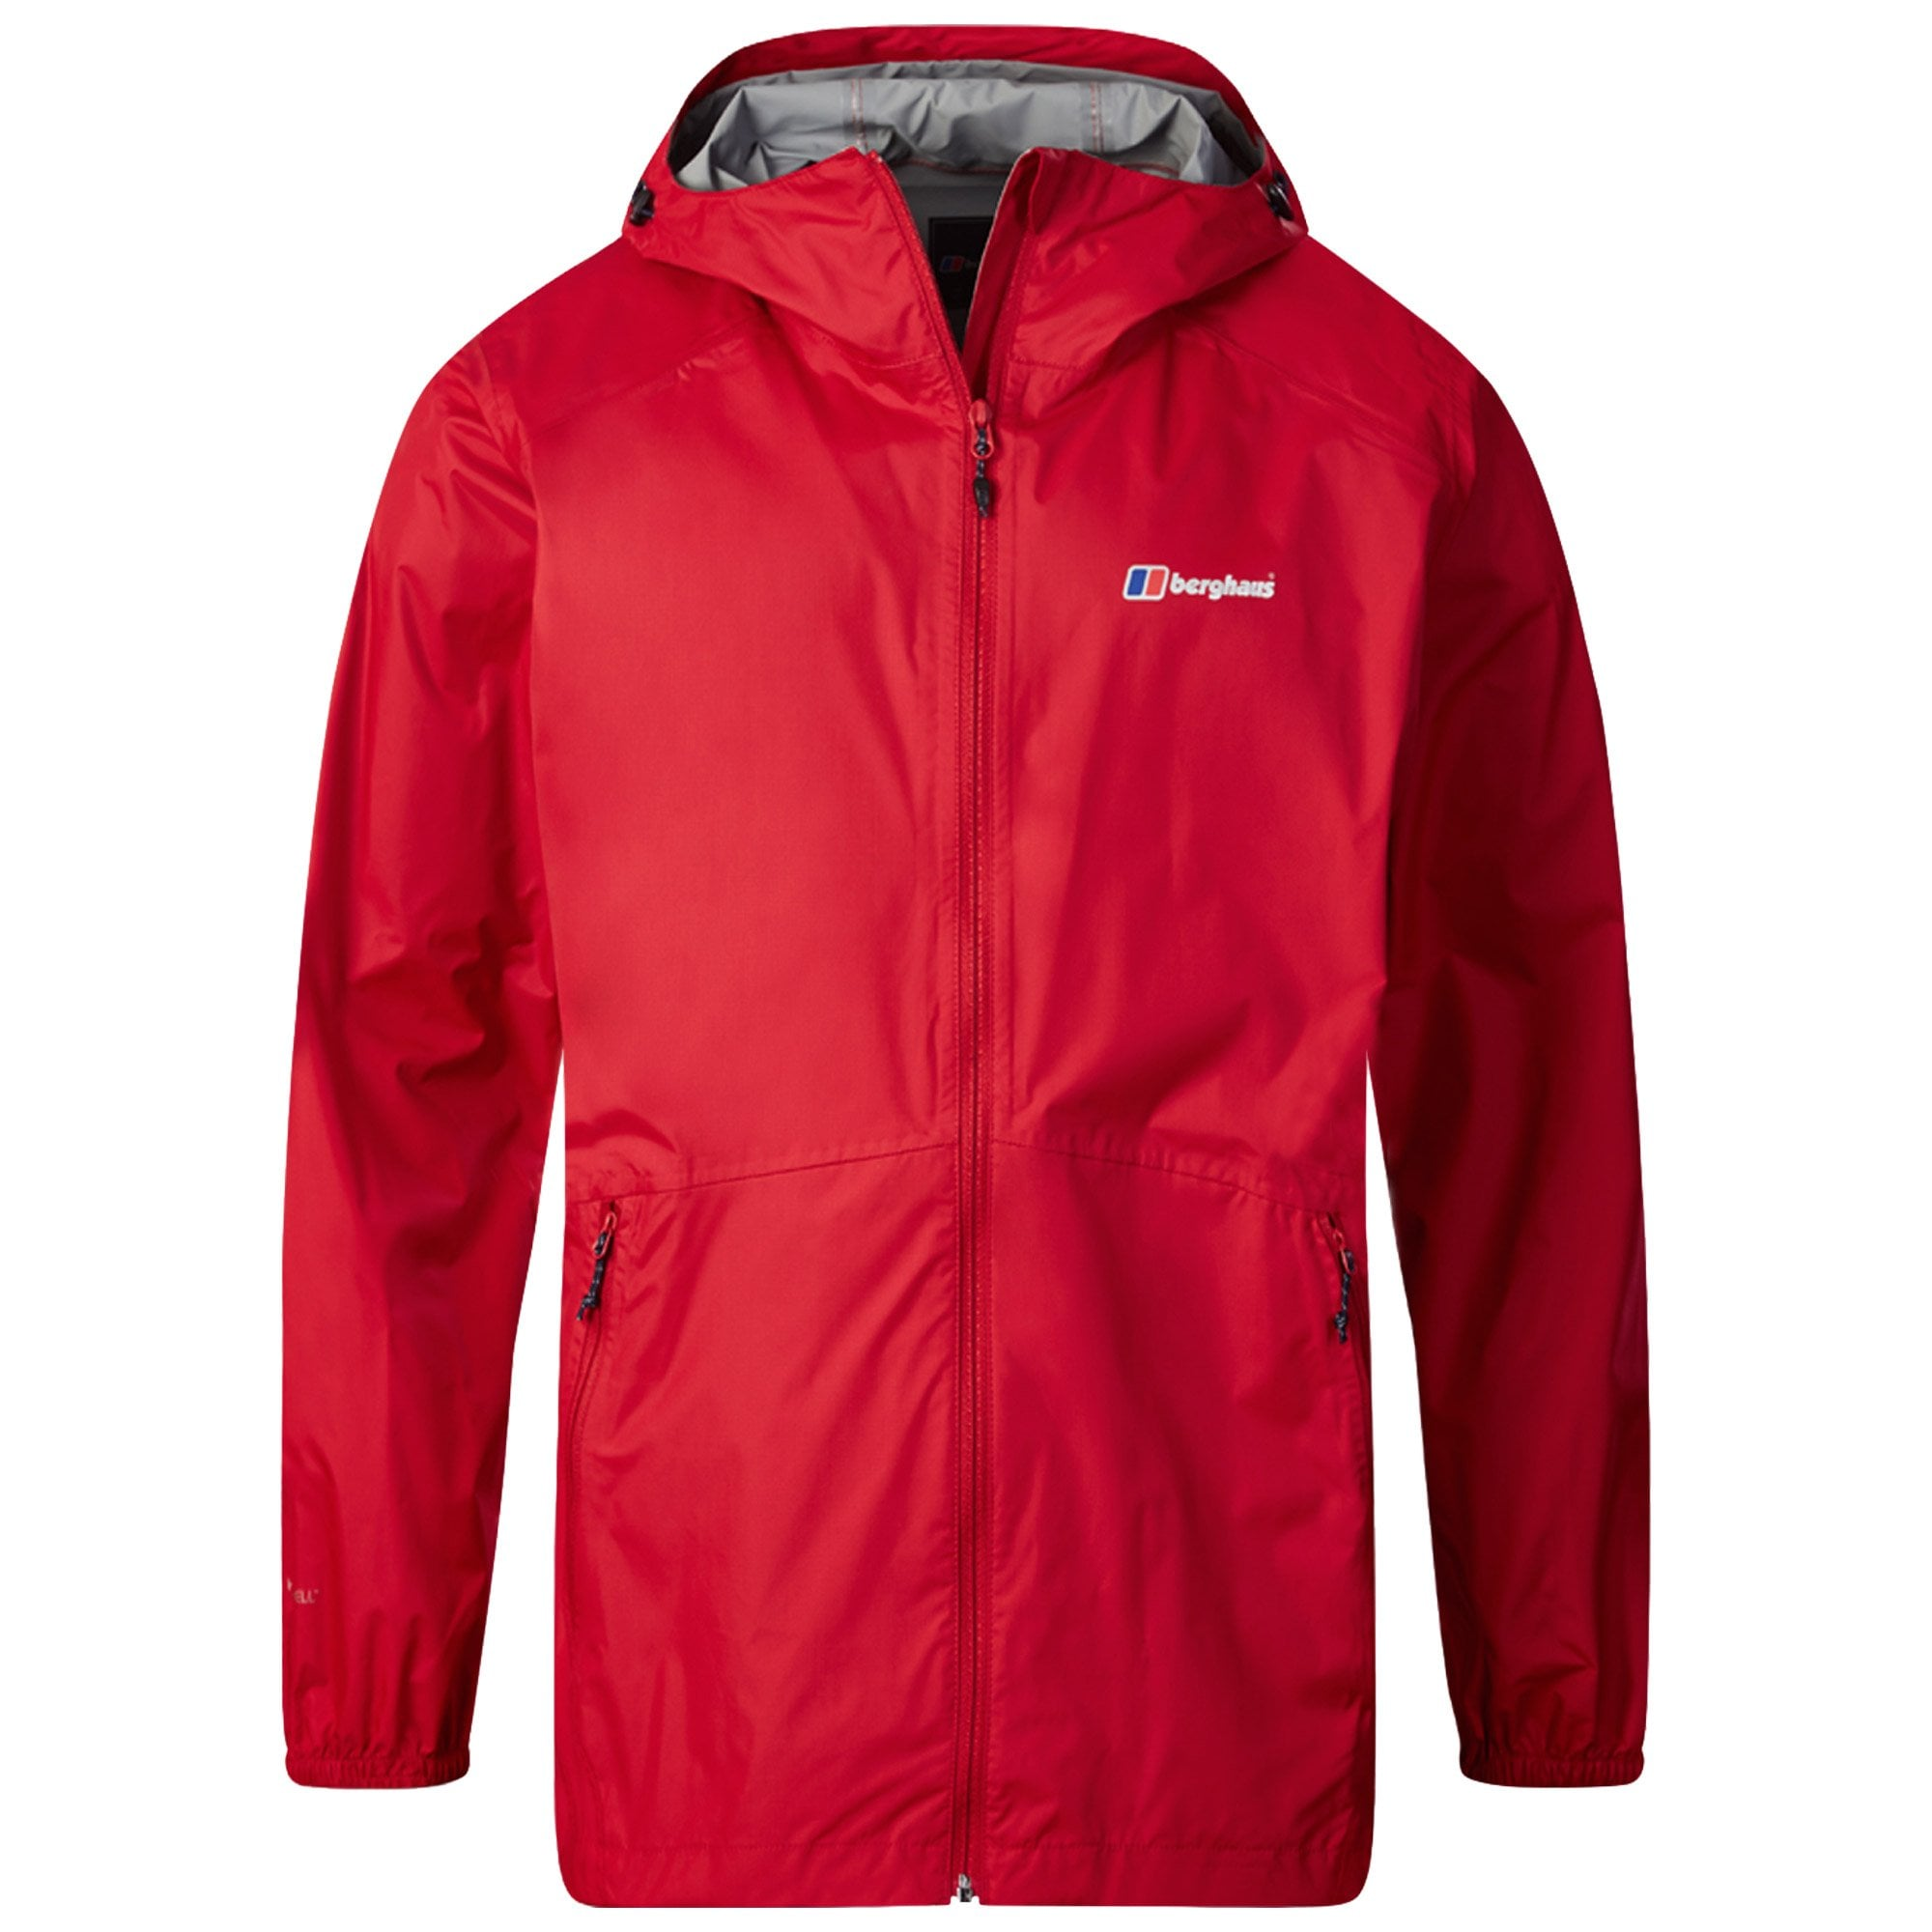 berghaus Mens Deluge Light Waterproof Shell Jacket